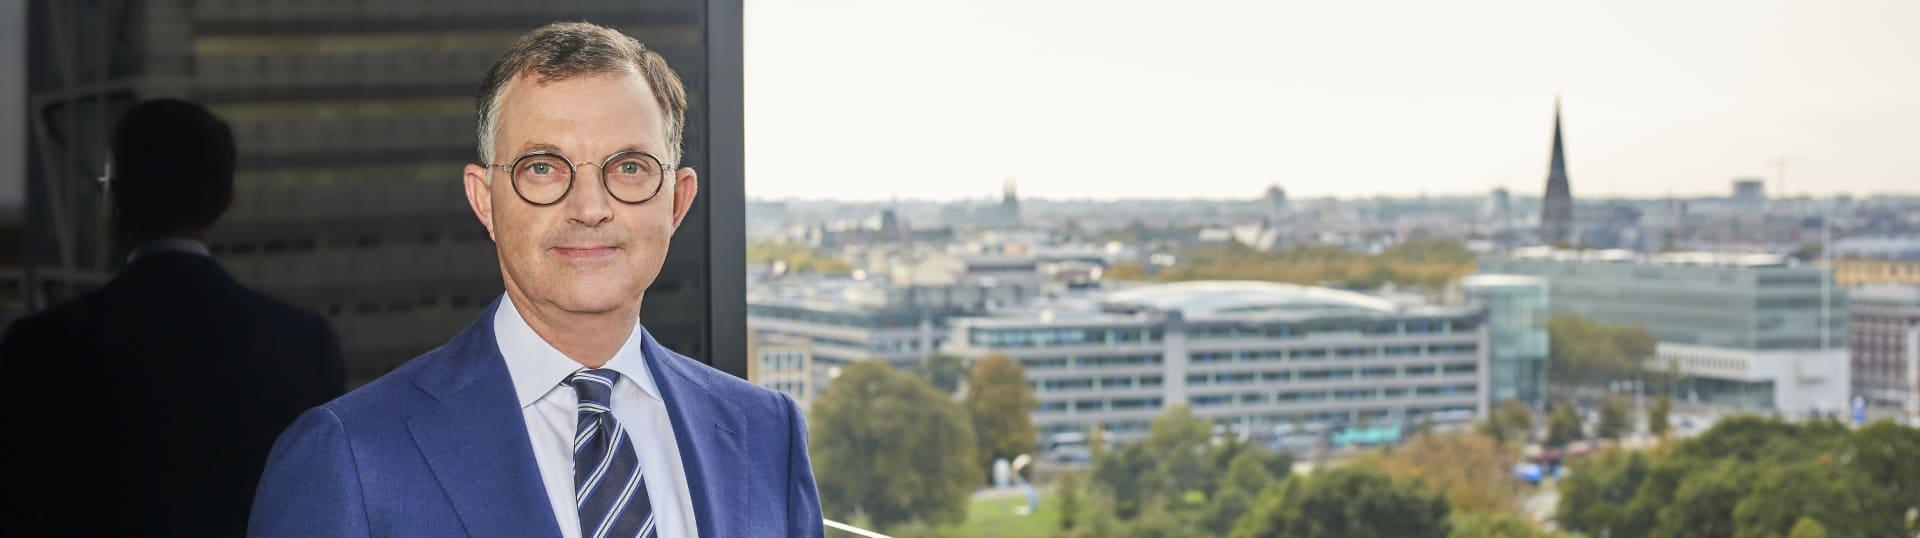 Frank Oranje, notaris Pels Rijcken